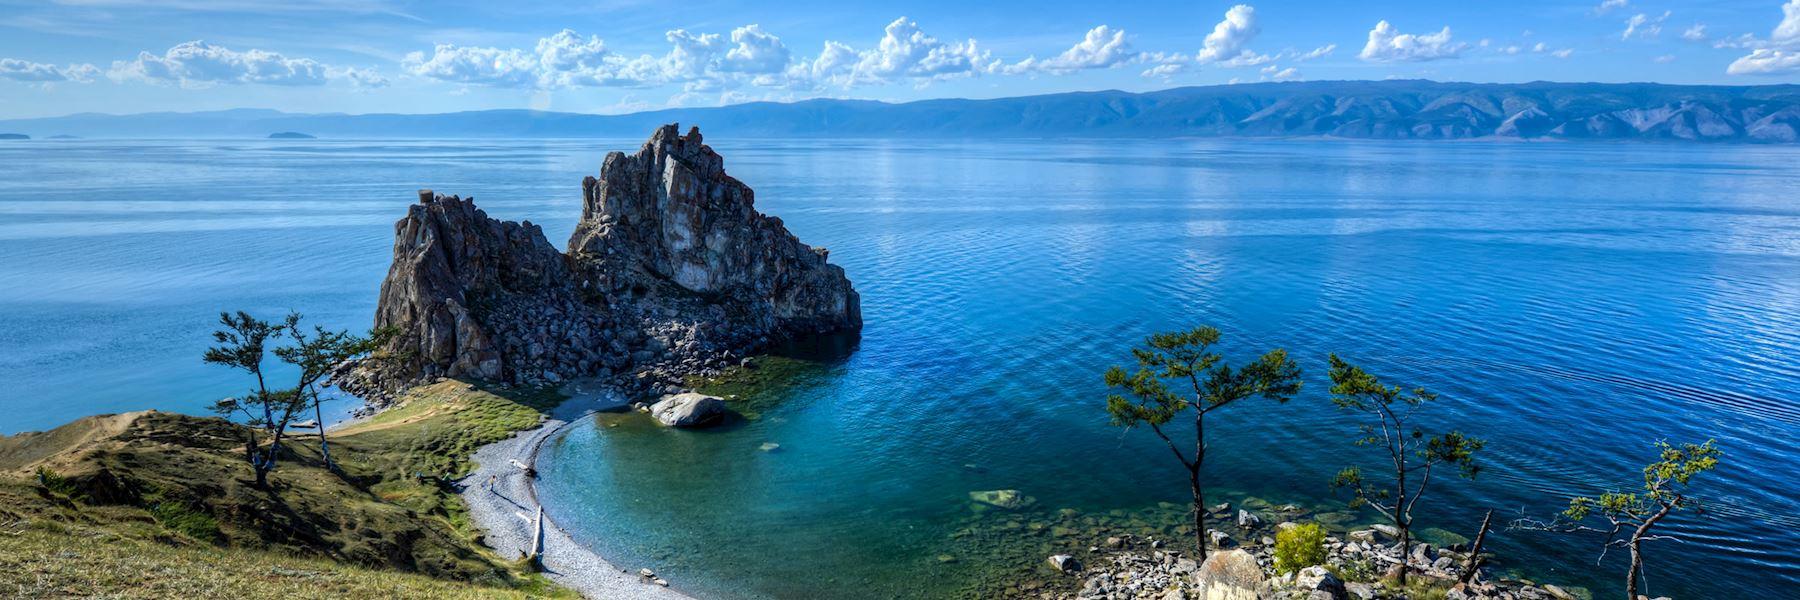 Visit Lake Baikal, Russia